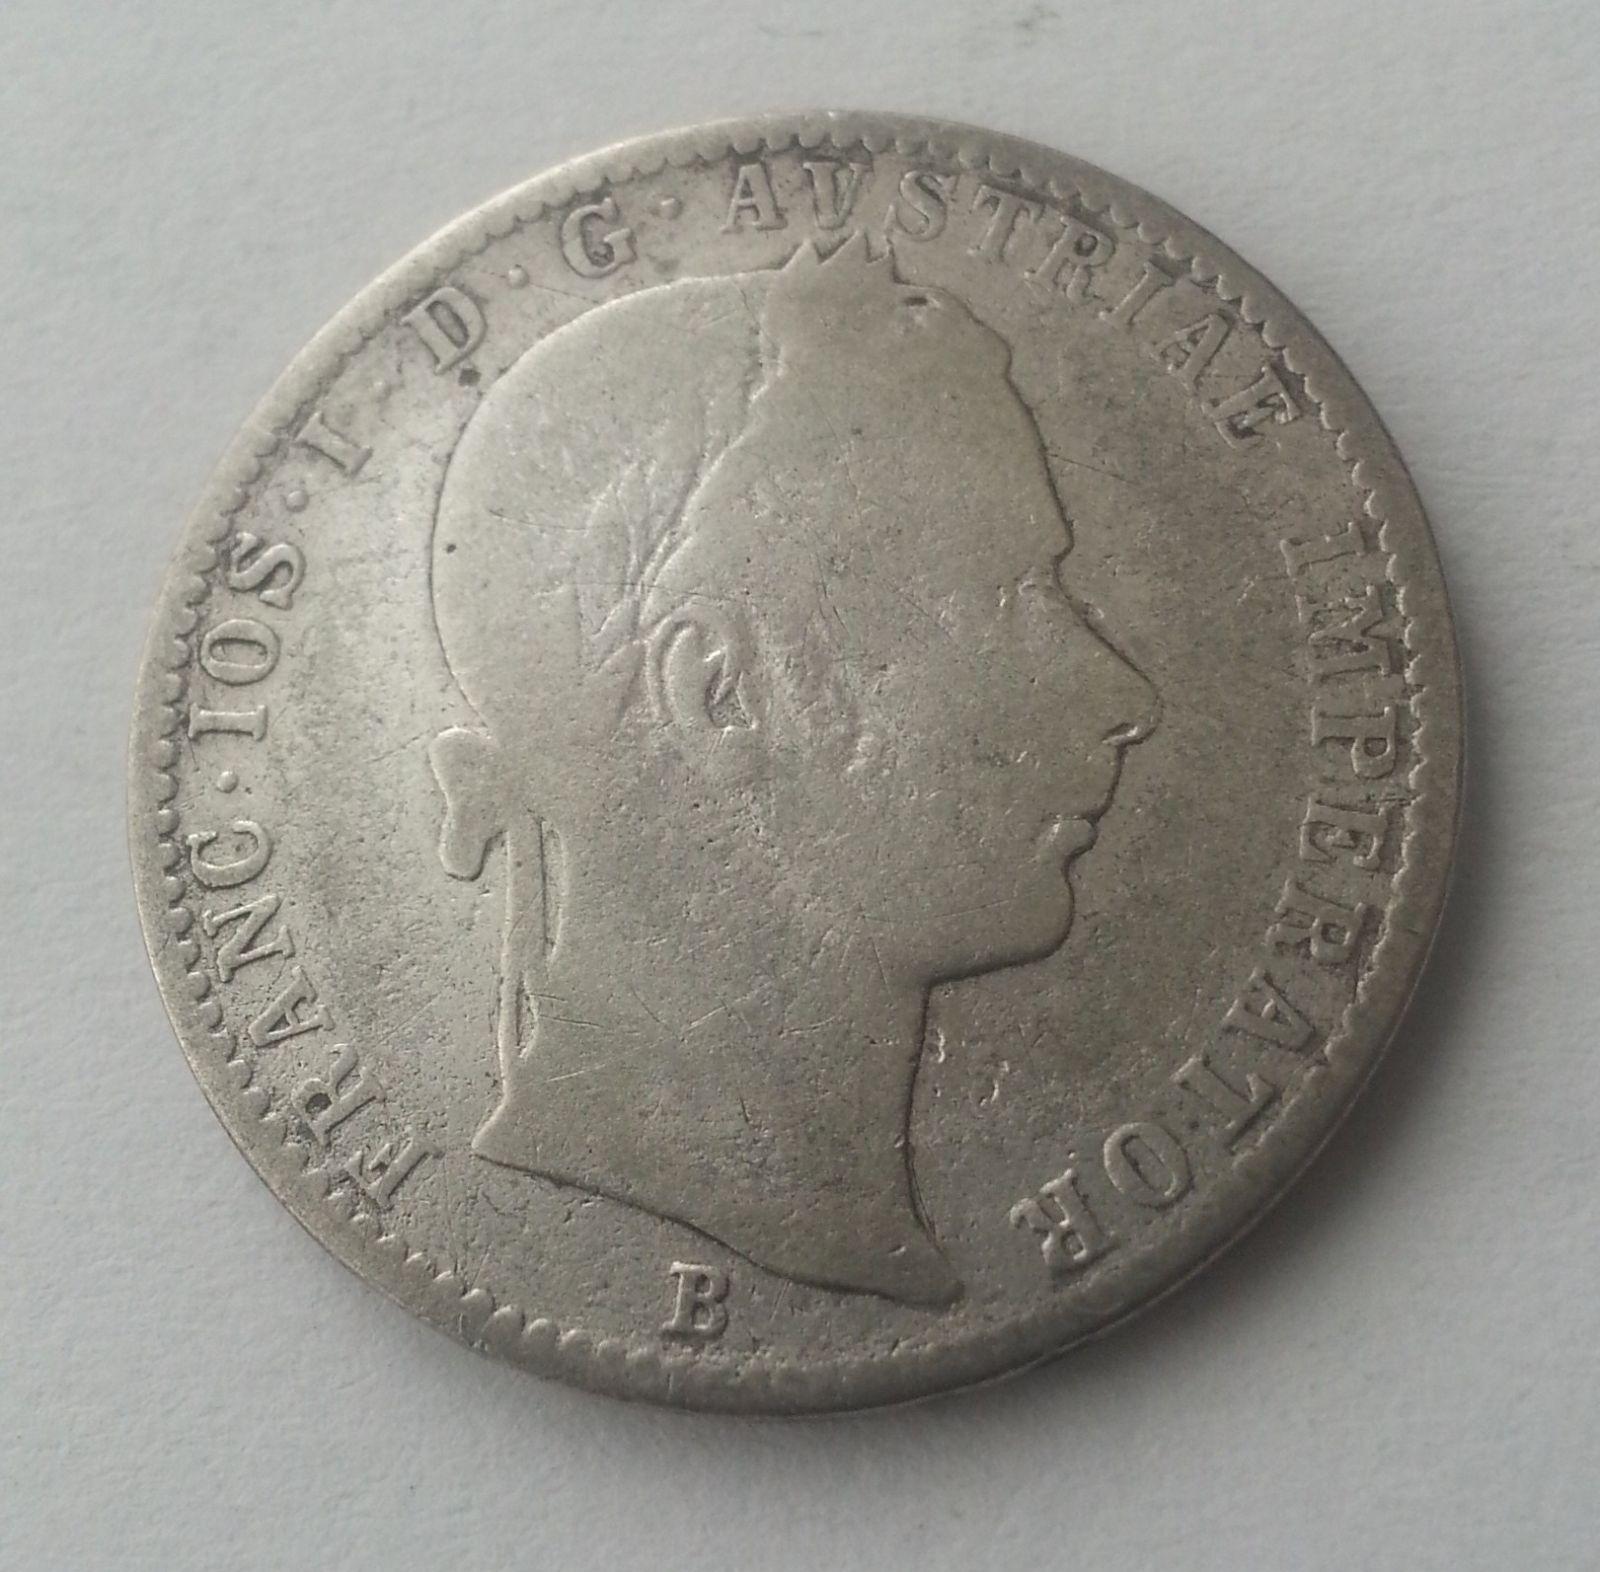 1/4 Fl.,1862, B, Uhry